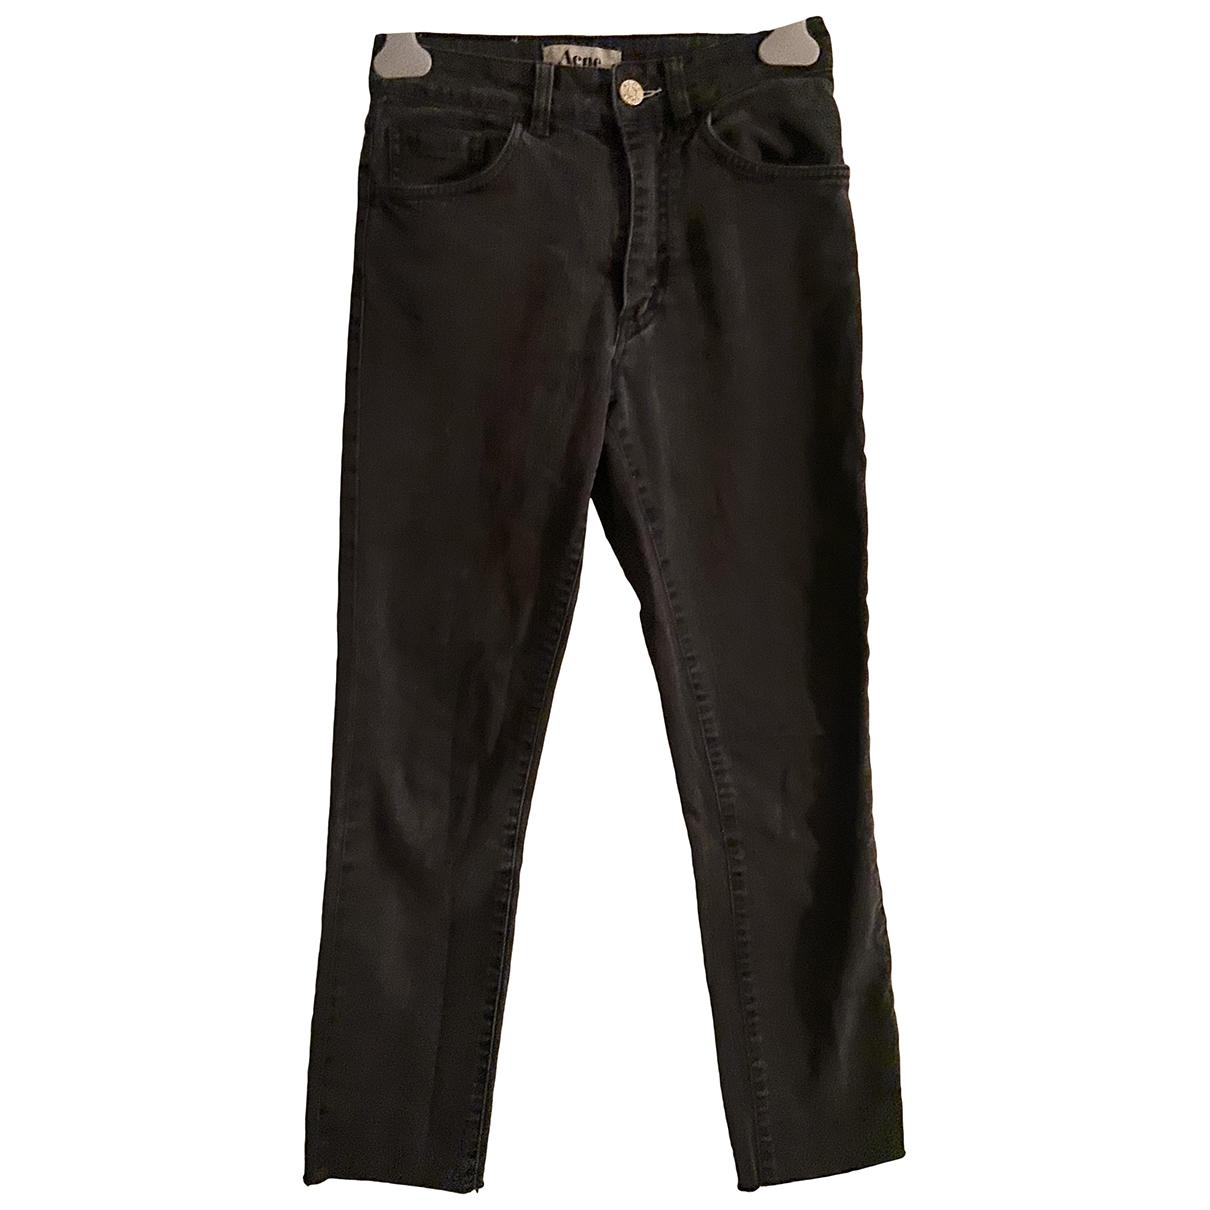 Acne Studios \N Grey Cotton - elasthane Jeans for Women 27 US